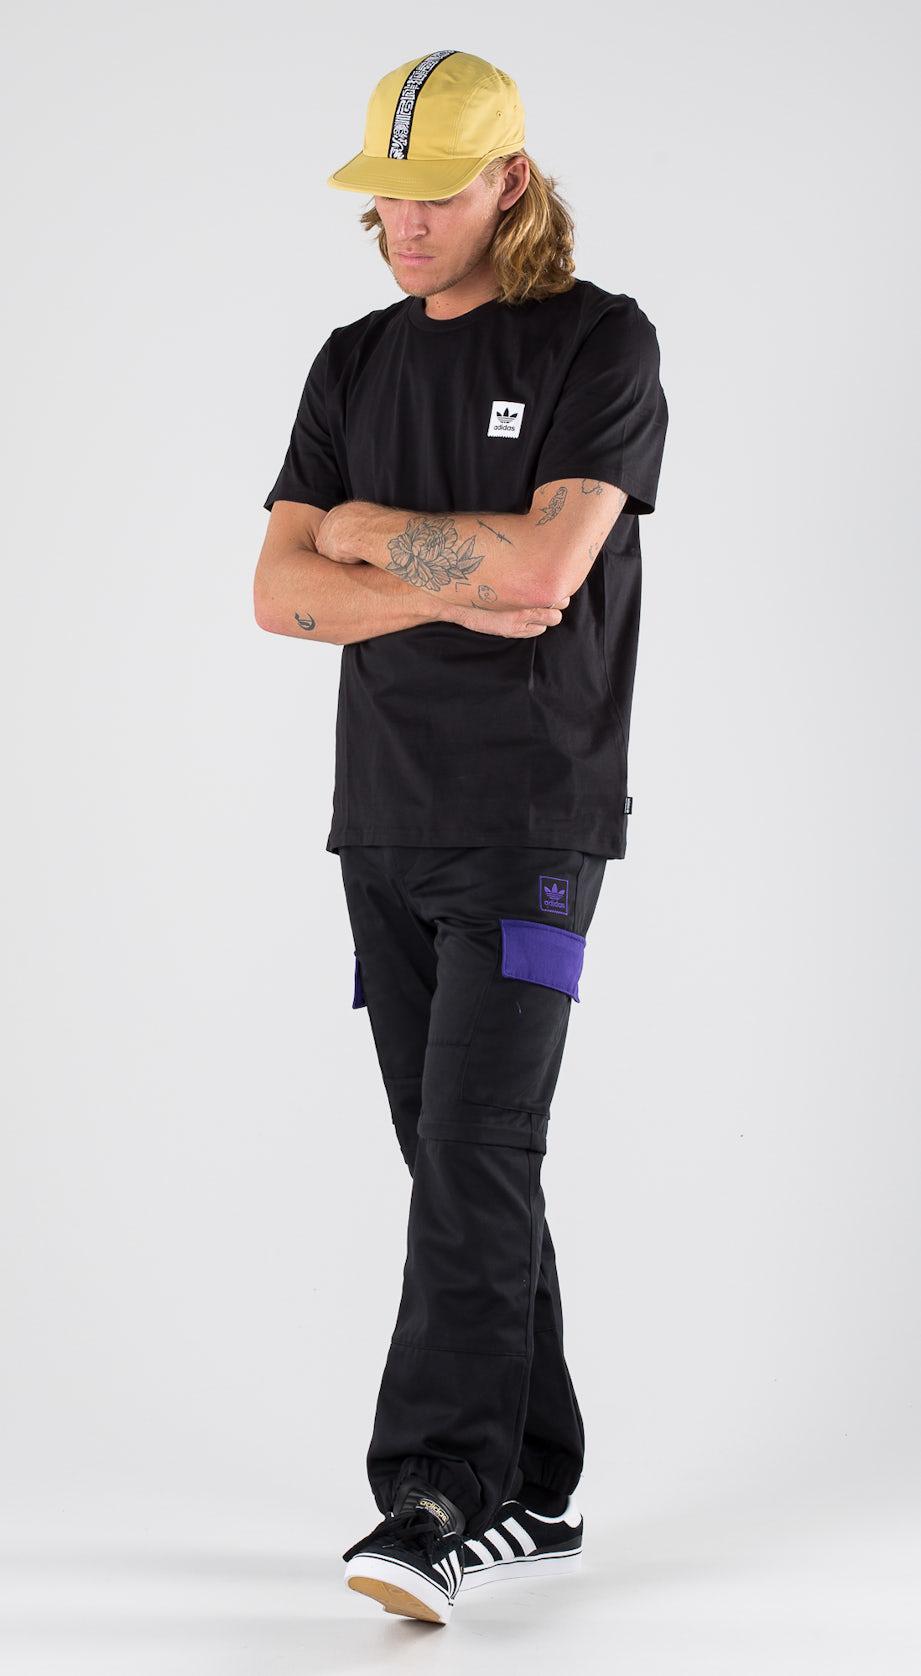 Adidas Skateboarding Bb 2.0 Black Outfit Multi